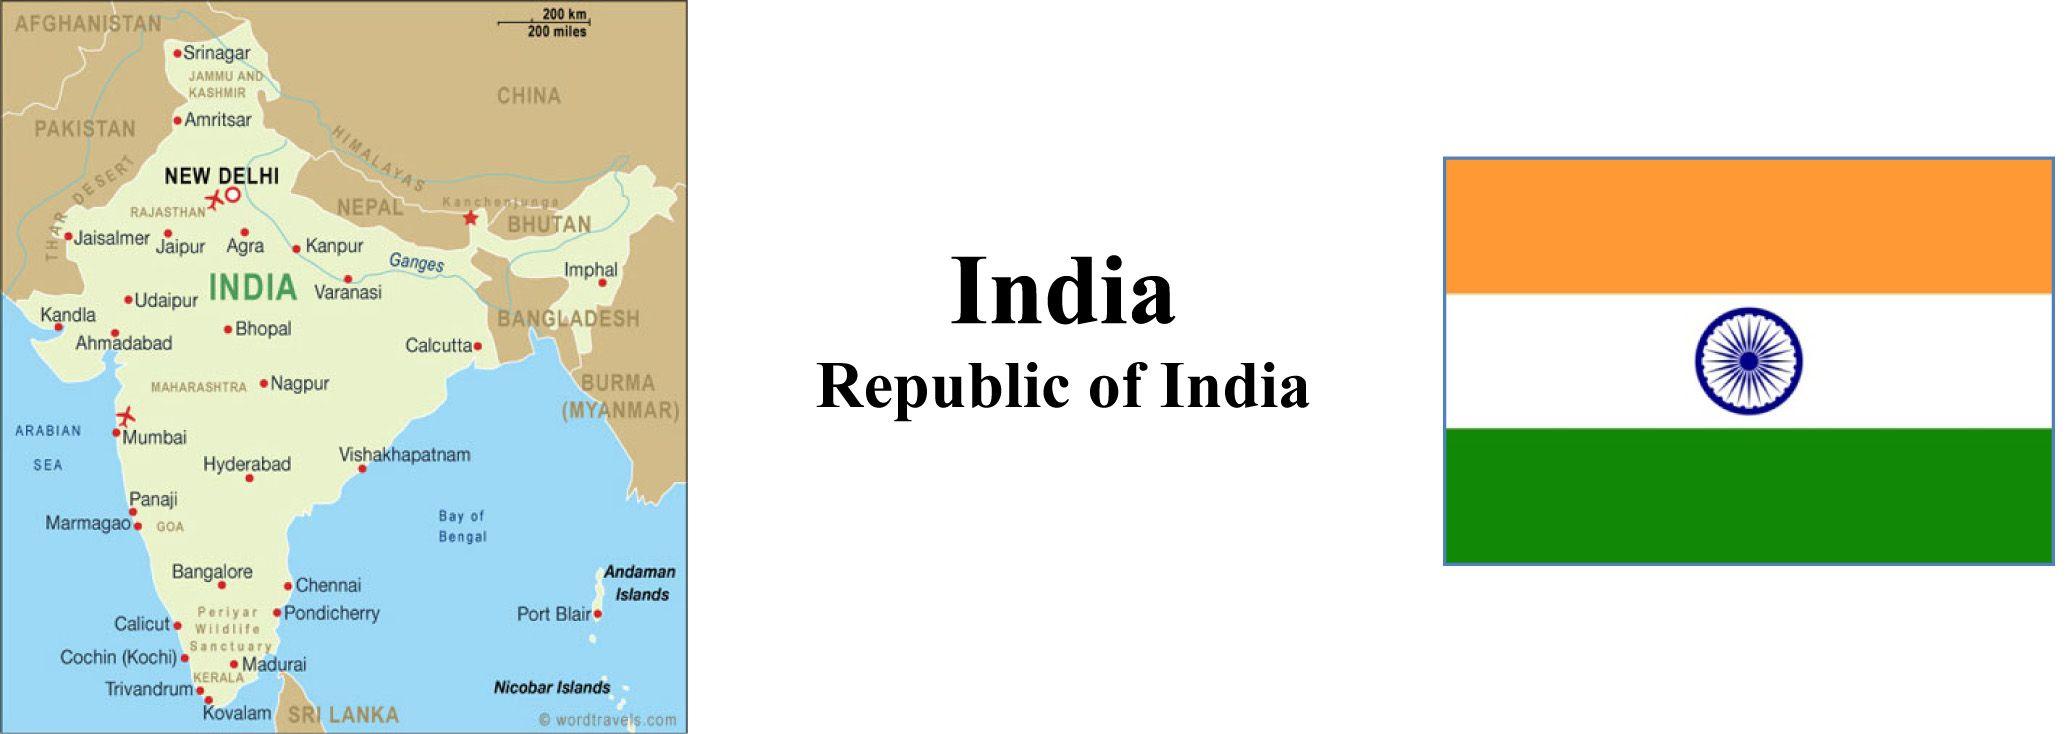 India Map & Flag